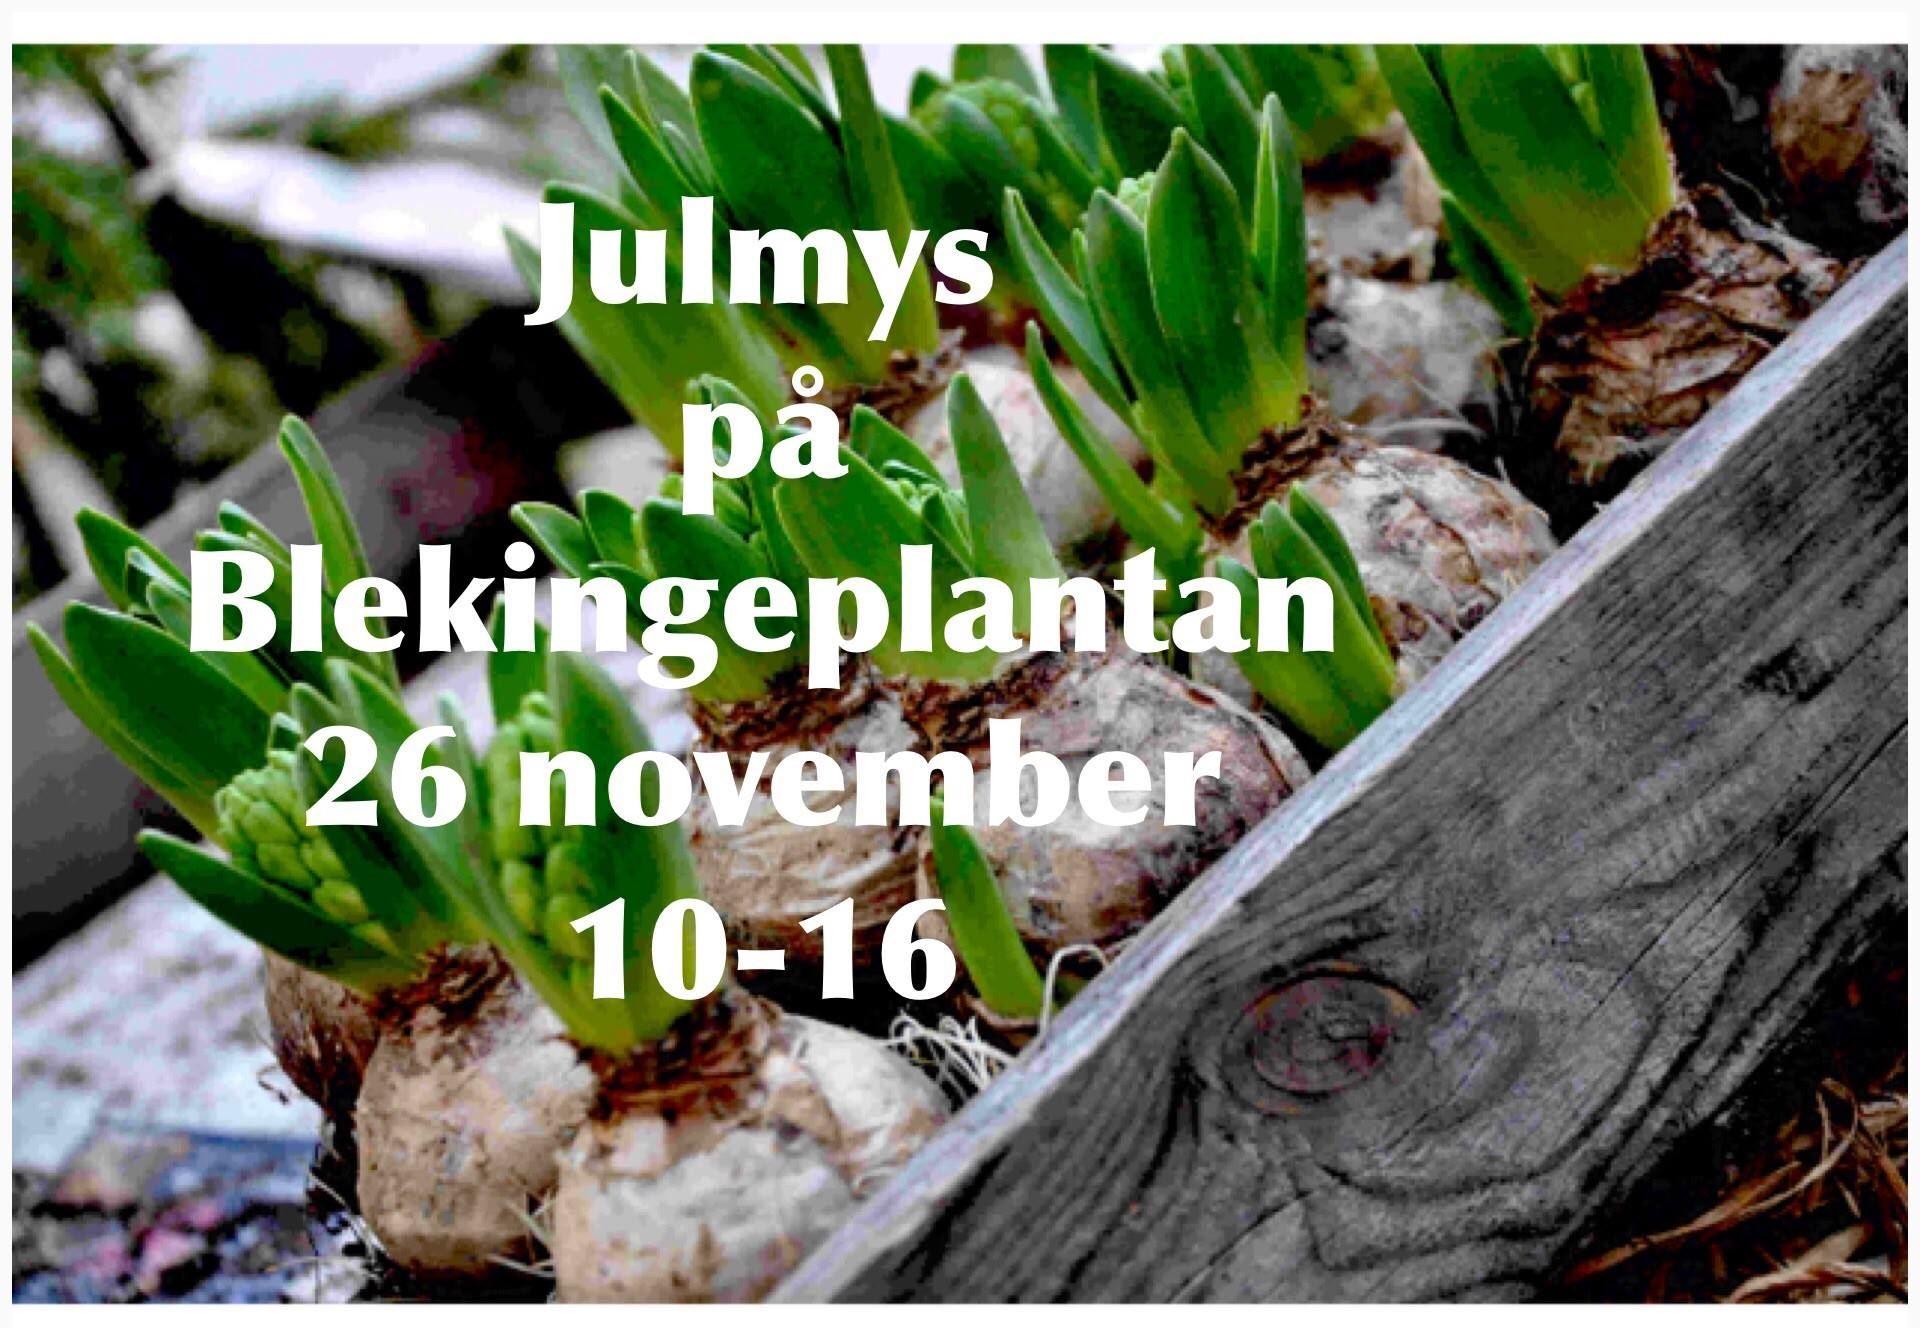 Christmas at Blekinge Plantan